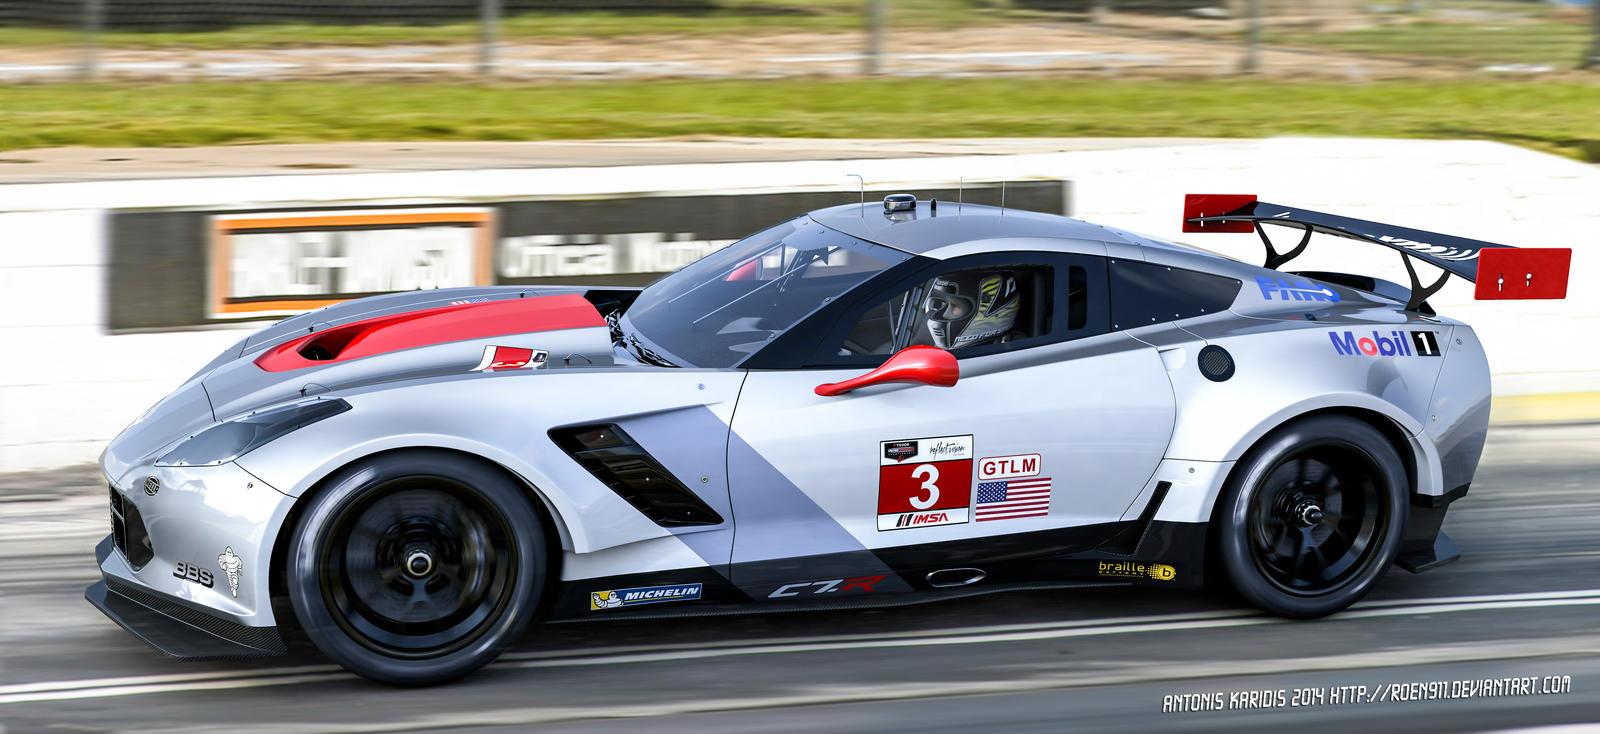 Corvette Racing C7 R Gt By Roen911 On Deviantart